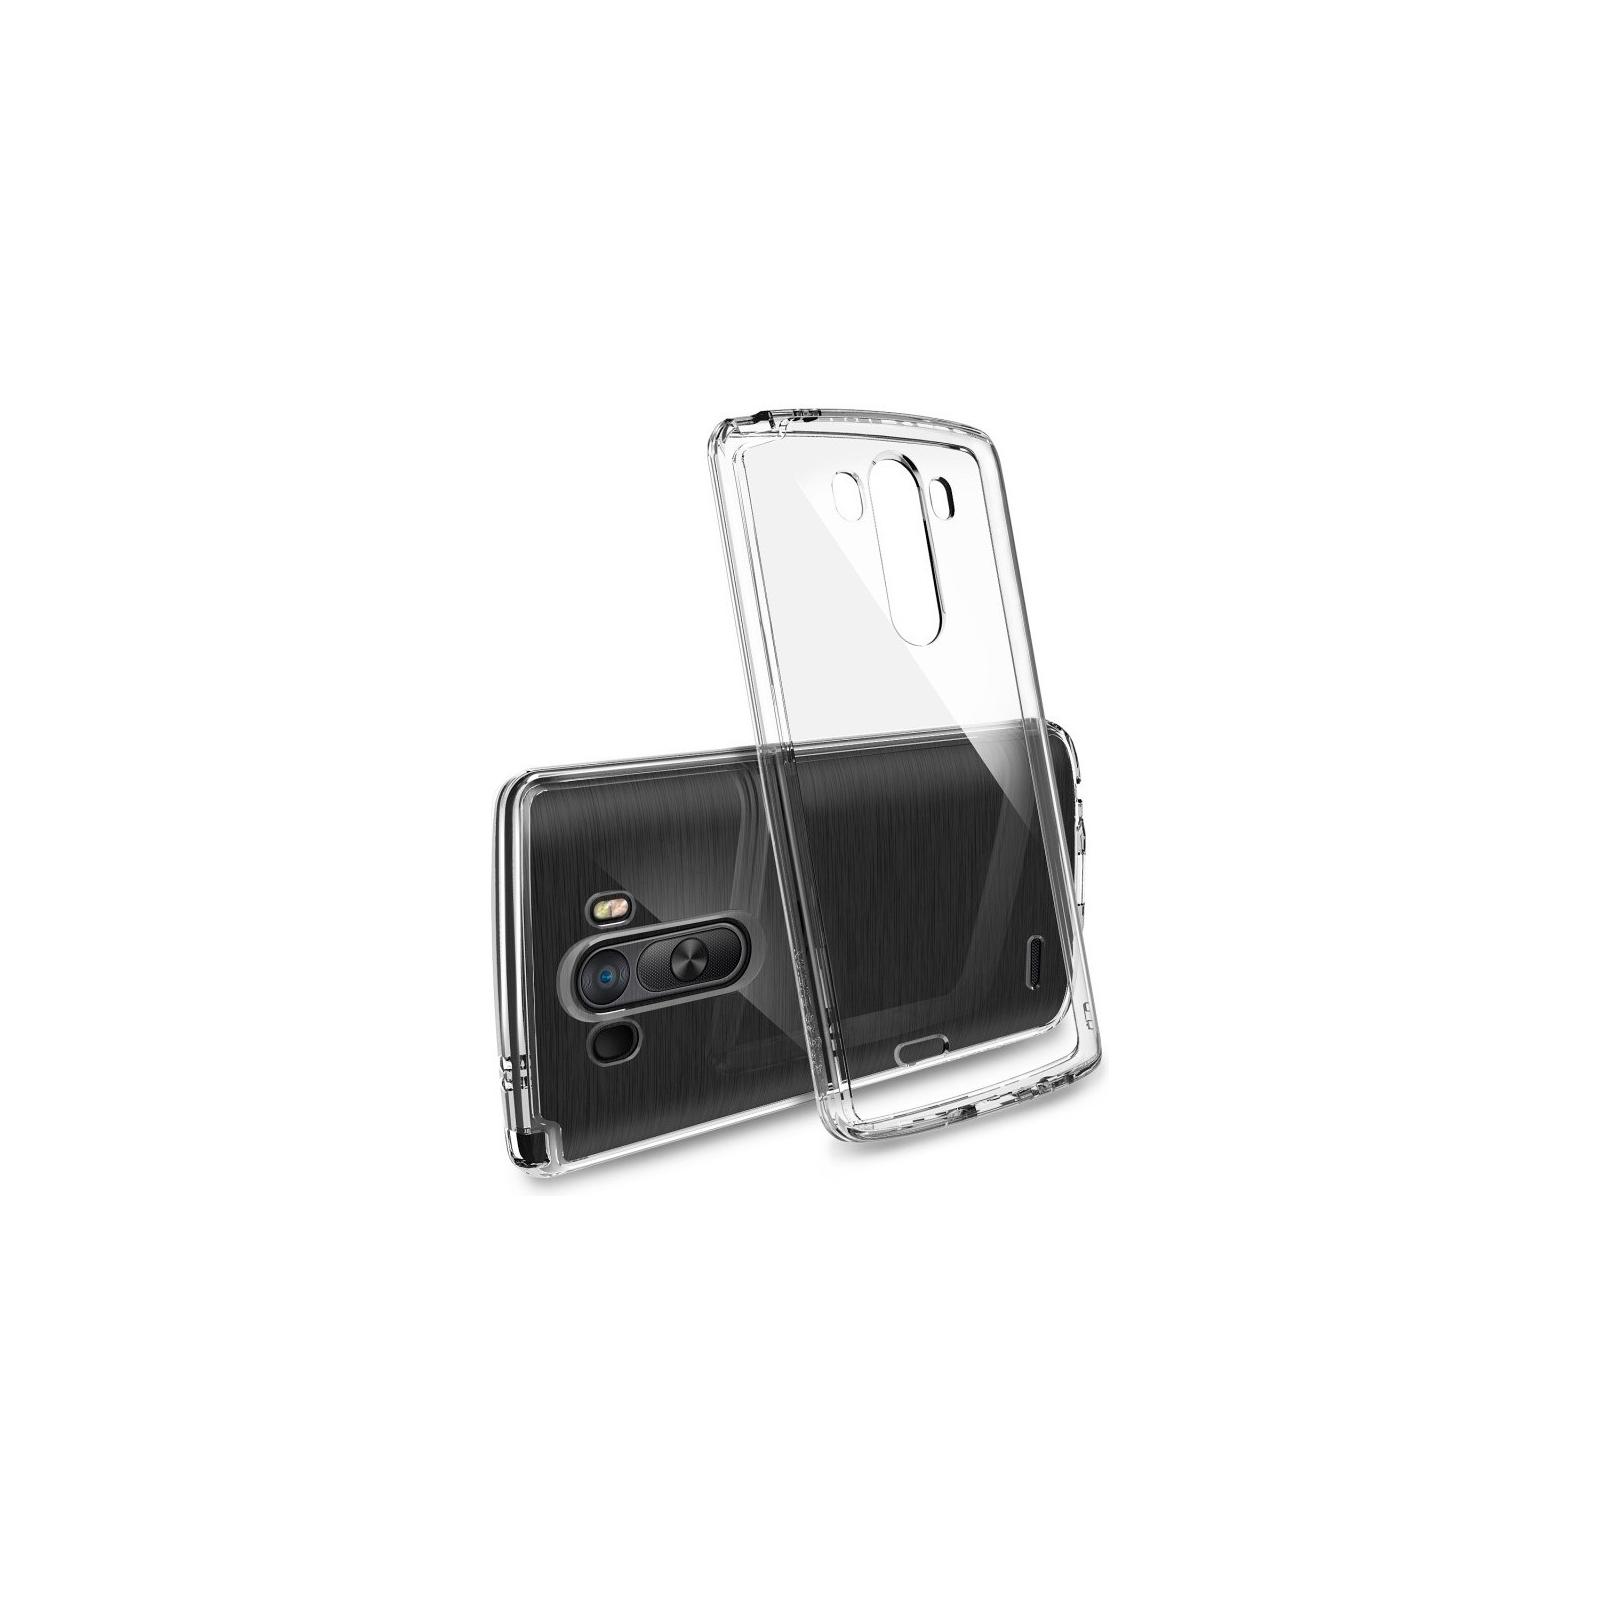 Чехол для моб. телефона Ringke Fusion для LG G3 (Crystal View) (157978)